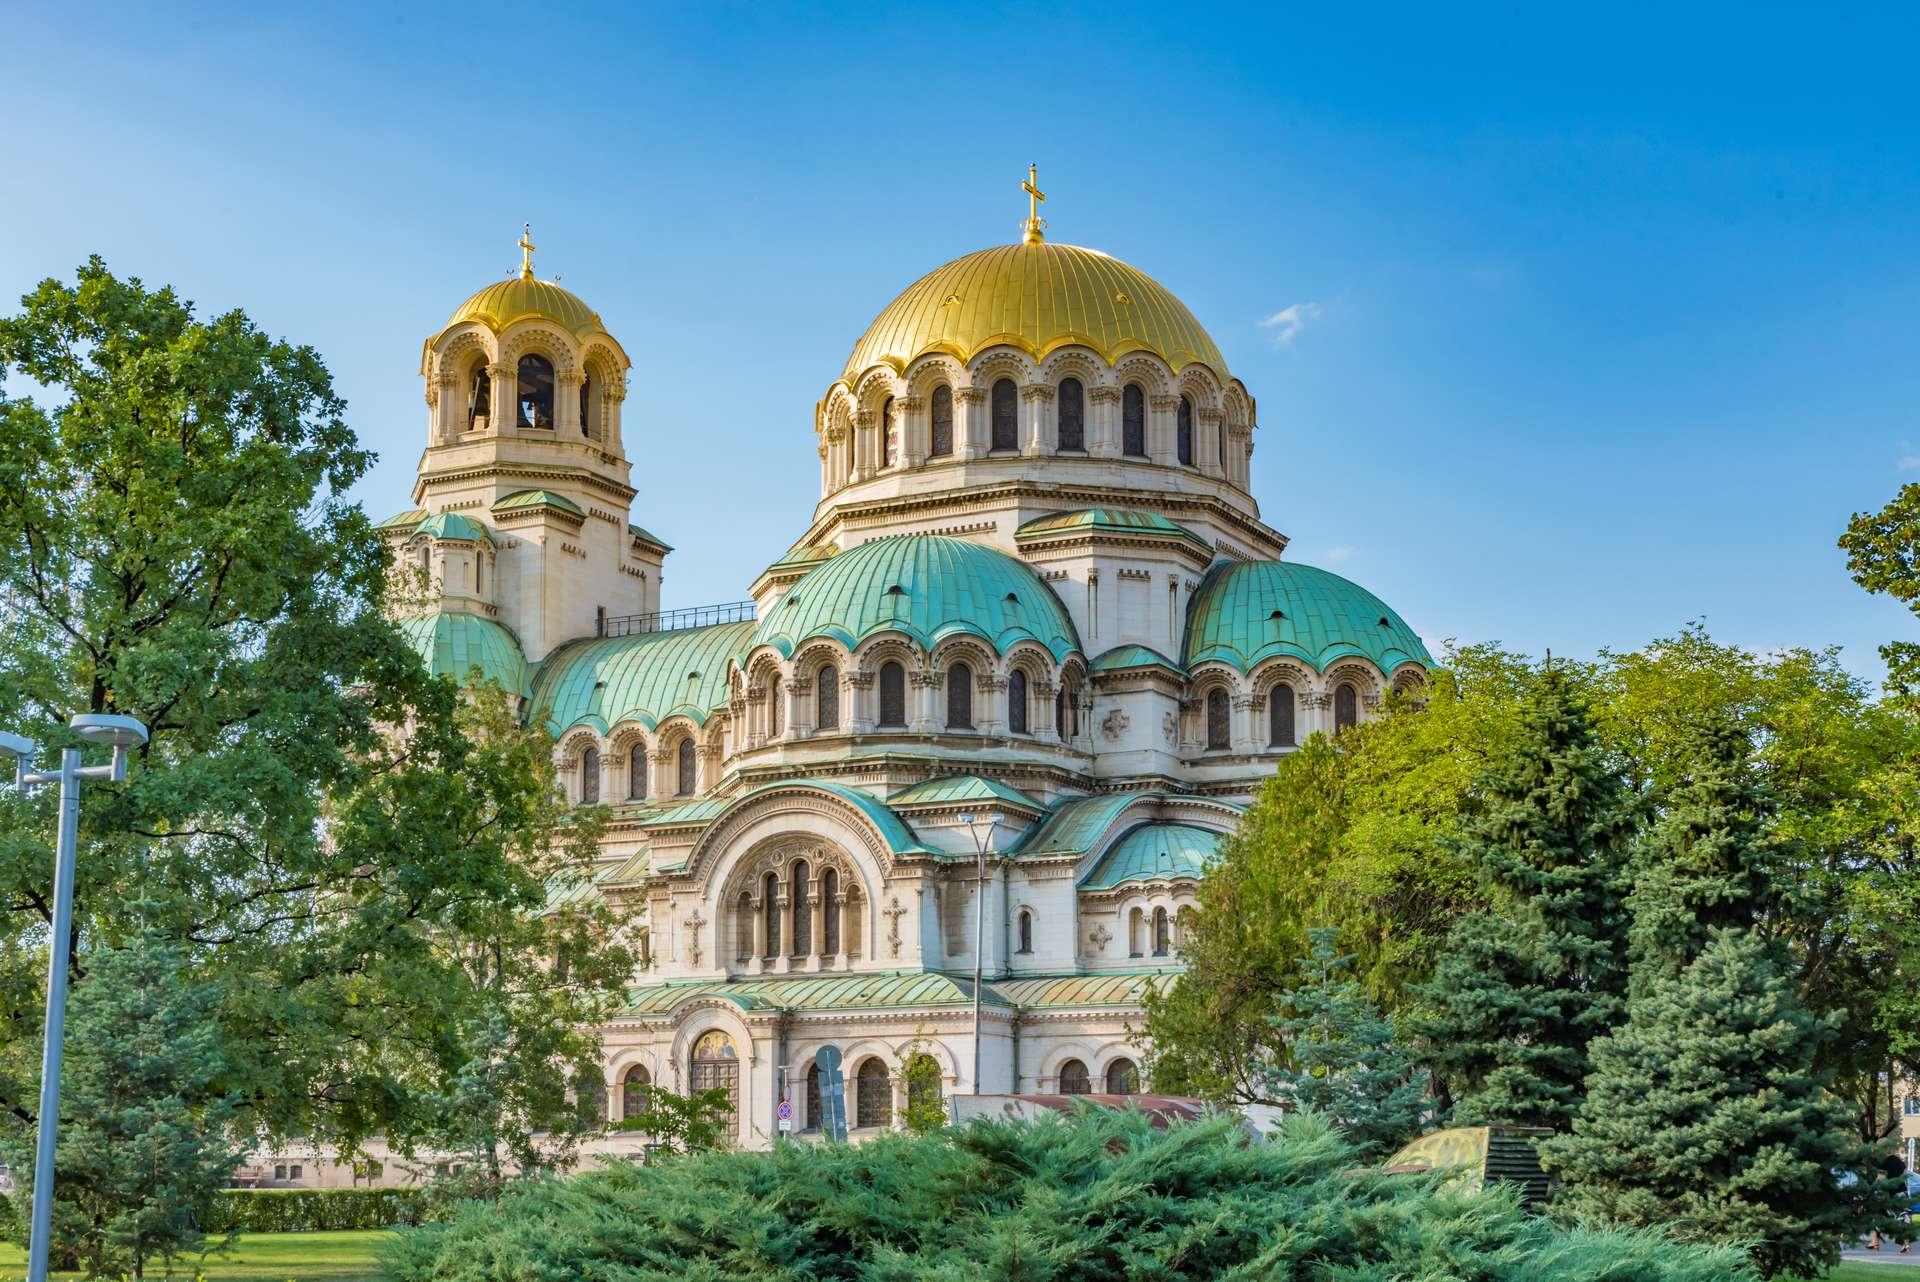 Bulgarije Sofia St. Alexander Nevsky Cathedral